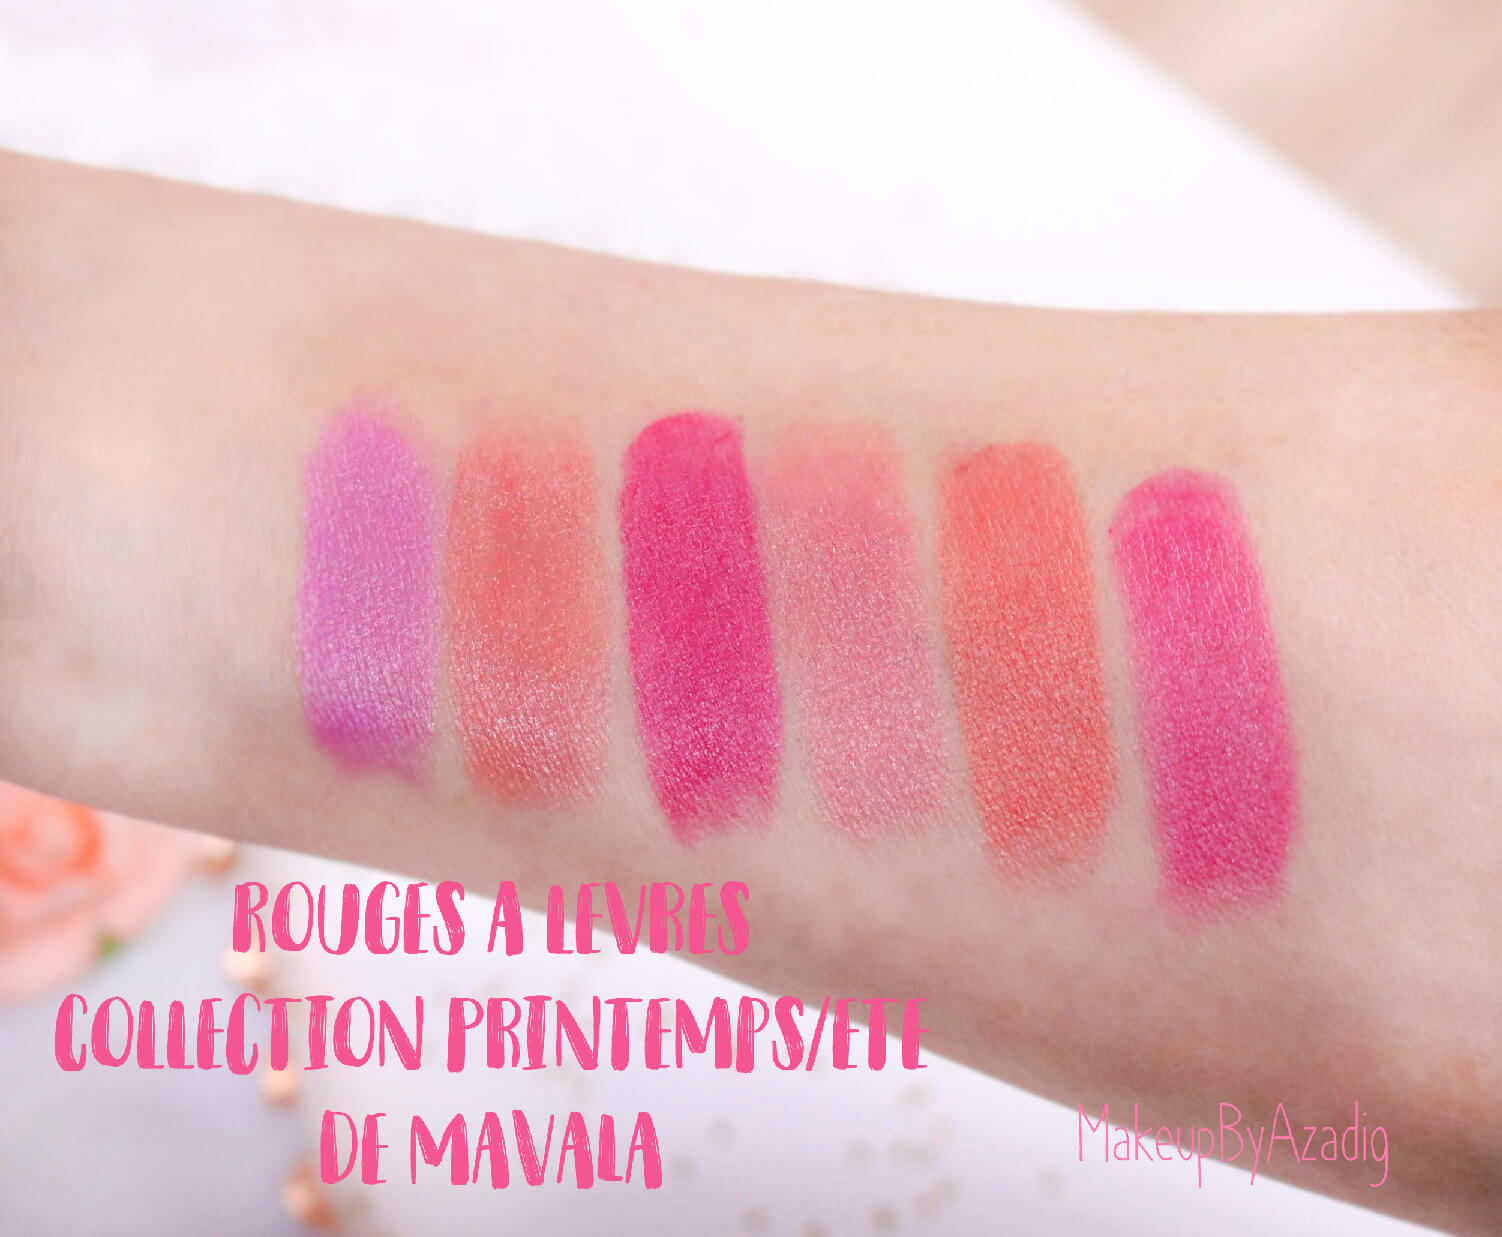 revue-rouge-levres-mavala-soin-monoprix-collection-printemps-ete-rose-nude-violet-avis-prix-makeupbyazadig-swatch